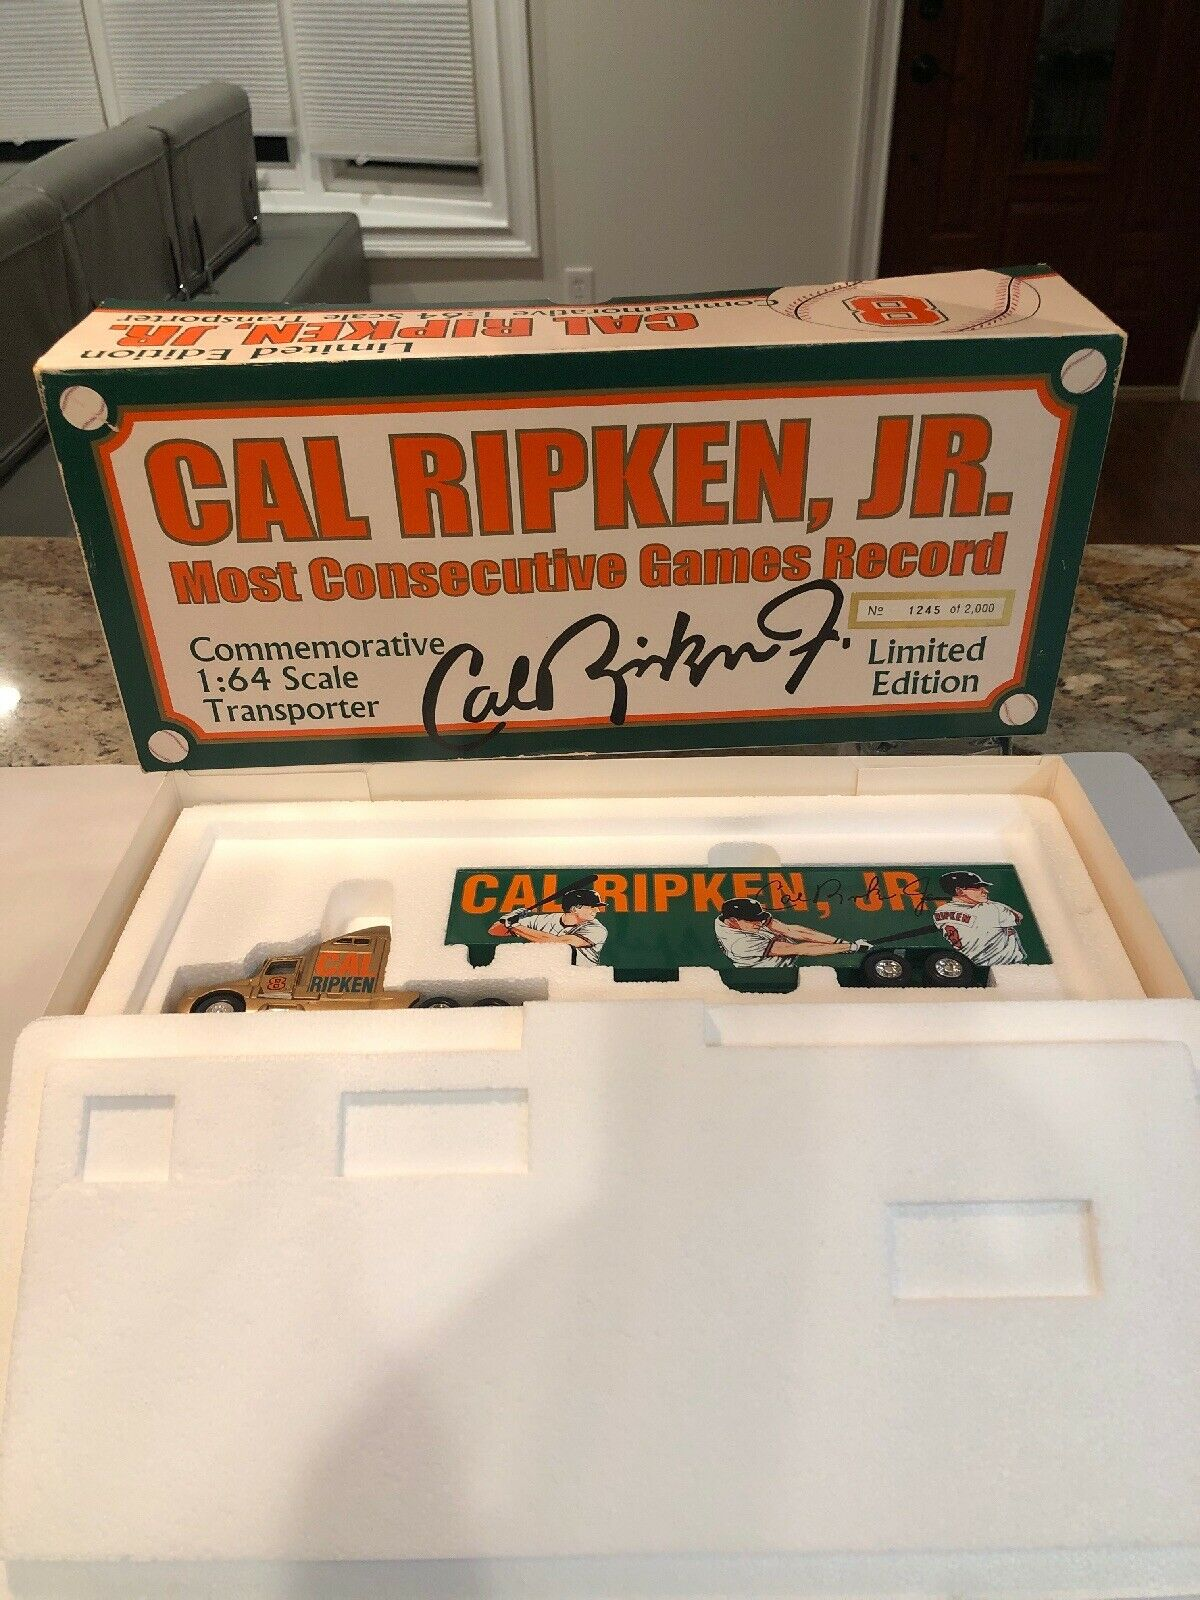 cómodamente Escala 1 64 Cal Ripken transportador de edición limitada conmemorativa conmemorativa conmemorativa Camión súper Raro  mejor calidad